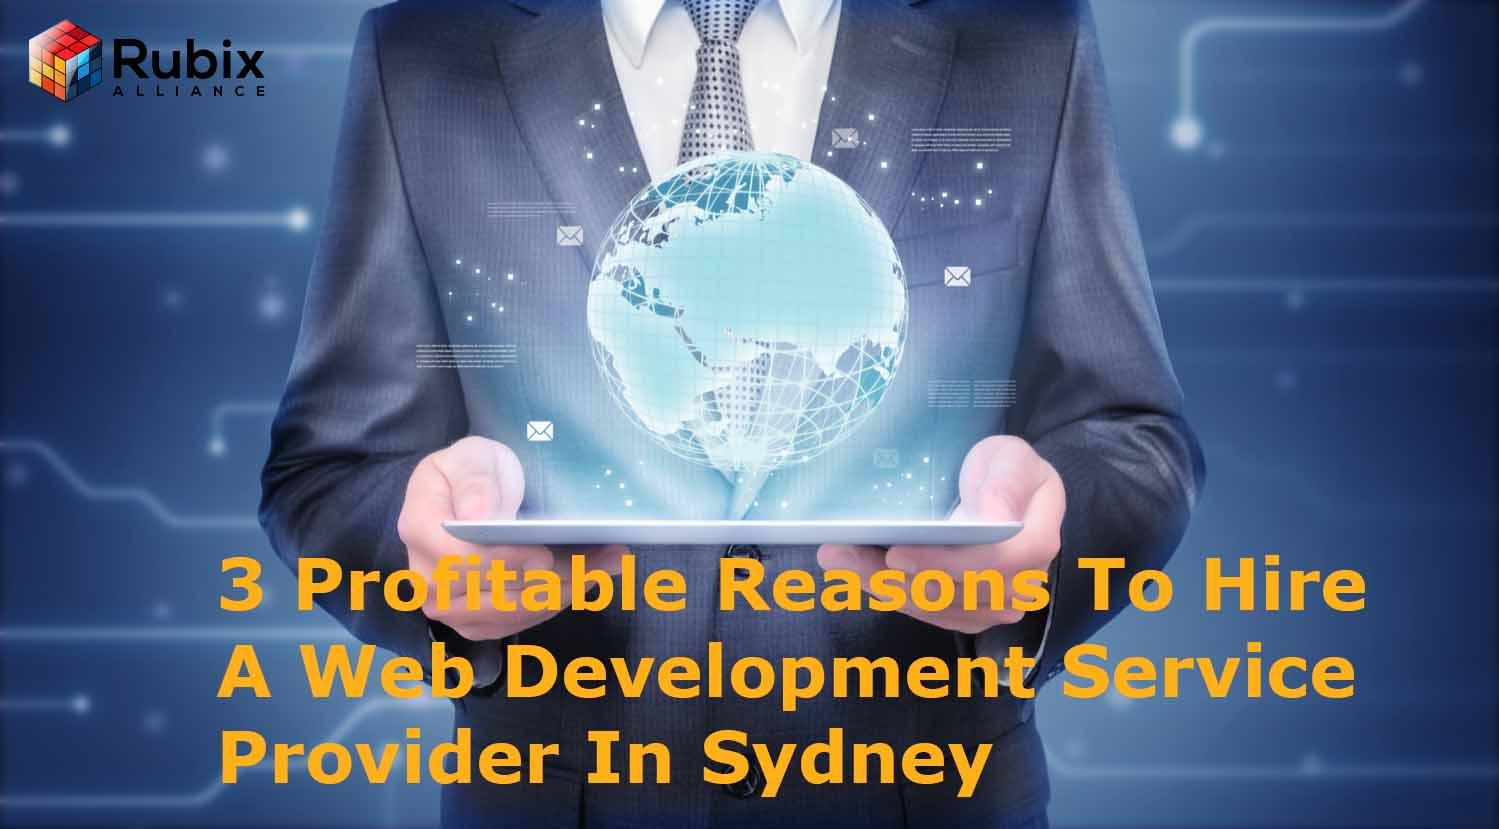 3 Profitable Reasons To Hire A Web Development Service Provider In Sydney